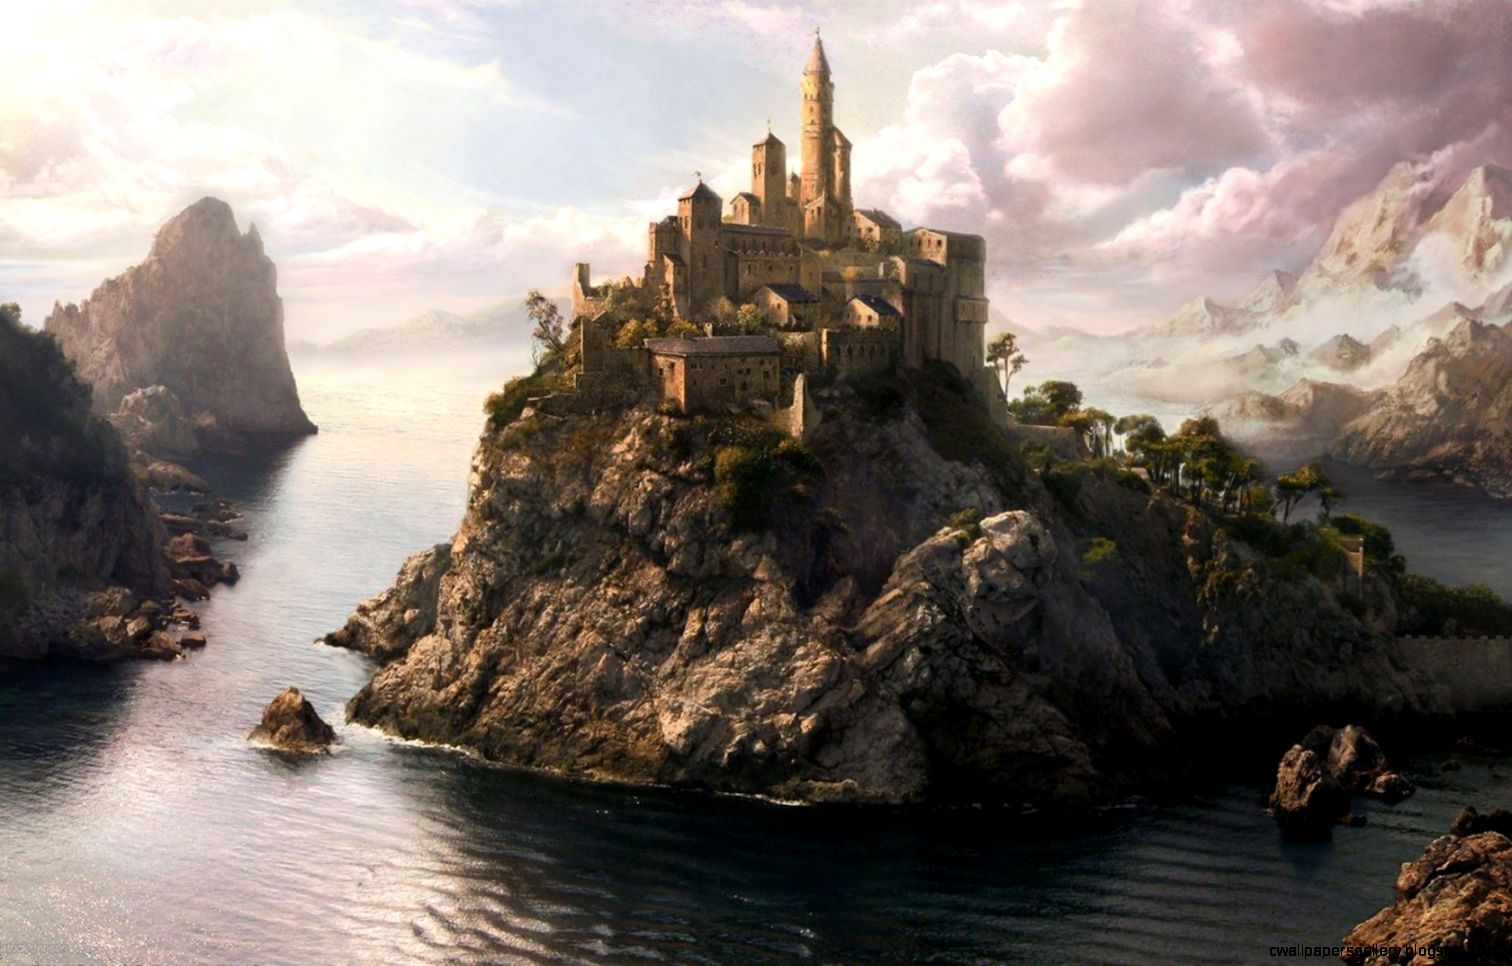 3D Landscape Fantasy Art Scenery desktop wallpaper nr 47786